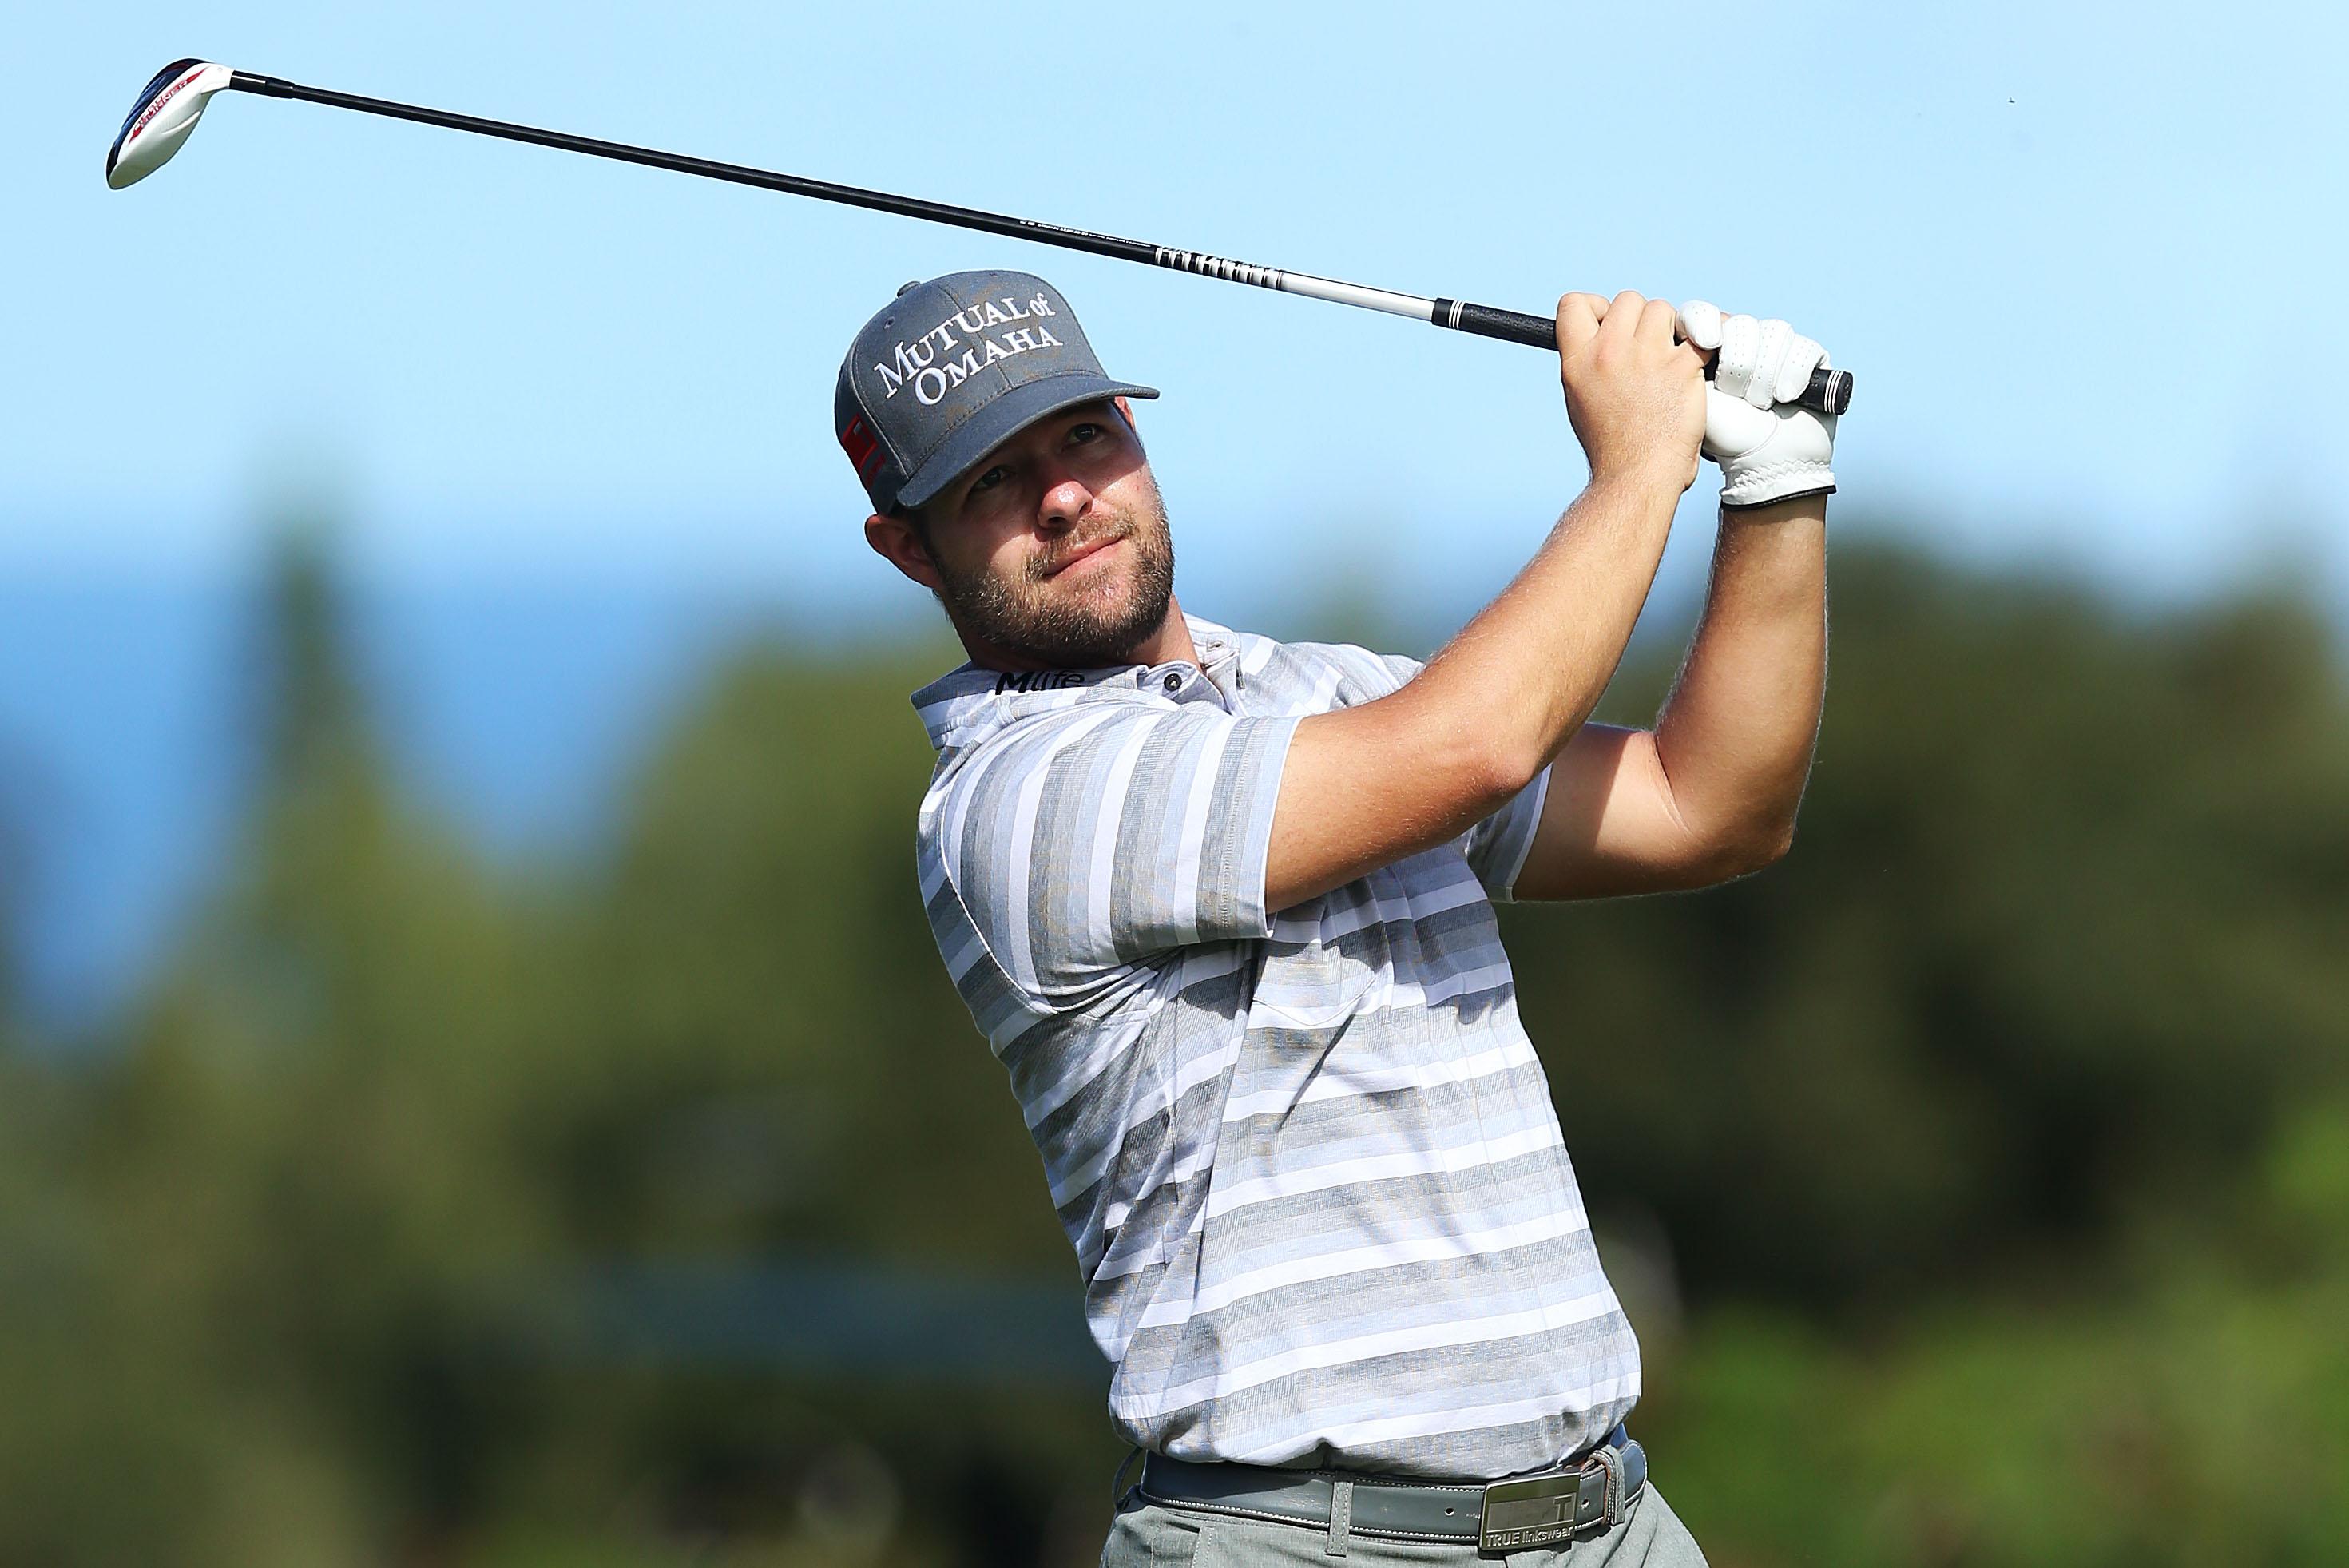 Ryan Moore grabbed an early-season Tour victory at the CIMB Classic in Kuala Lumpur, Malaysia in November.